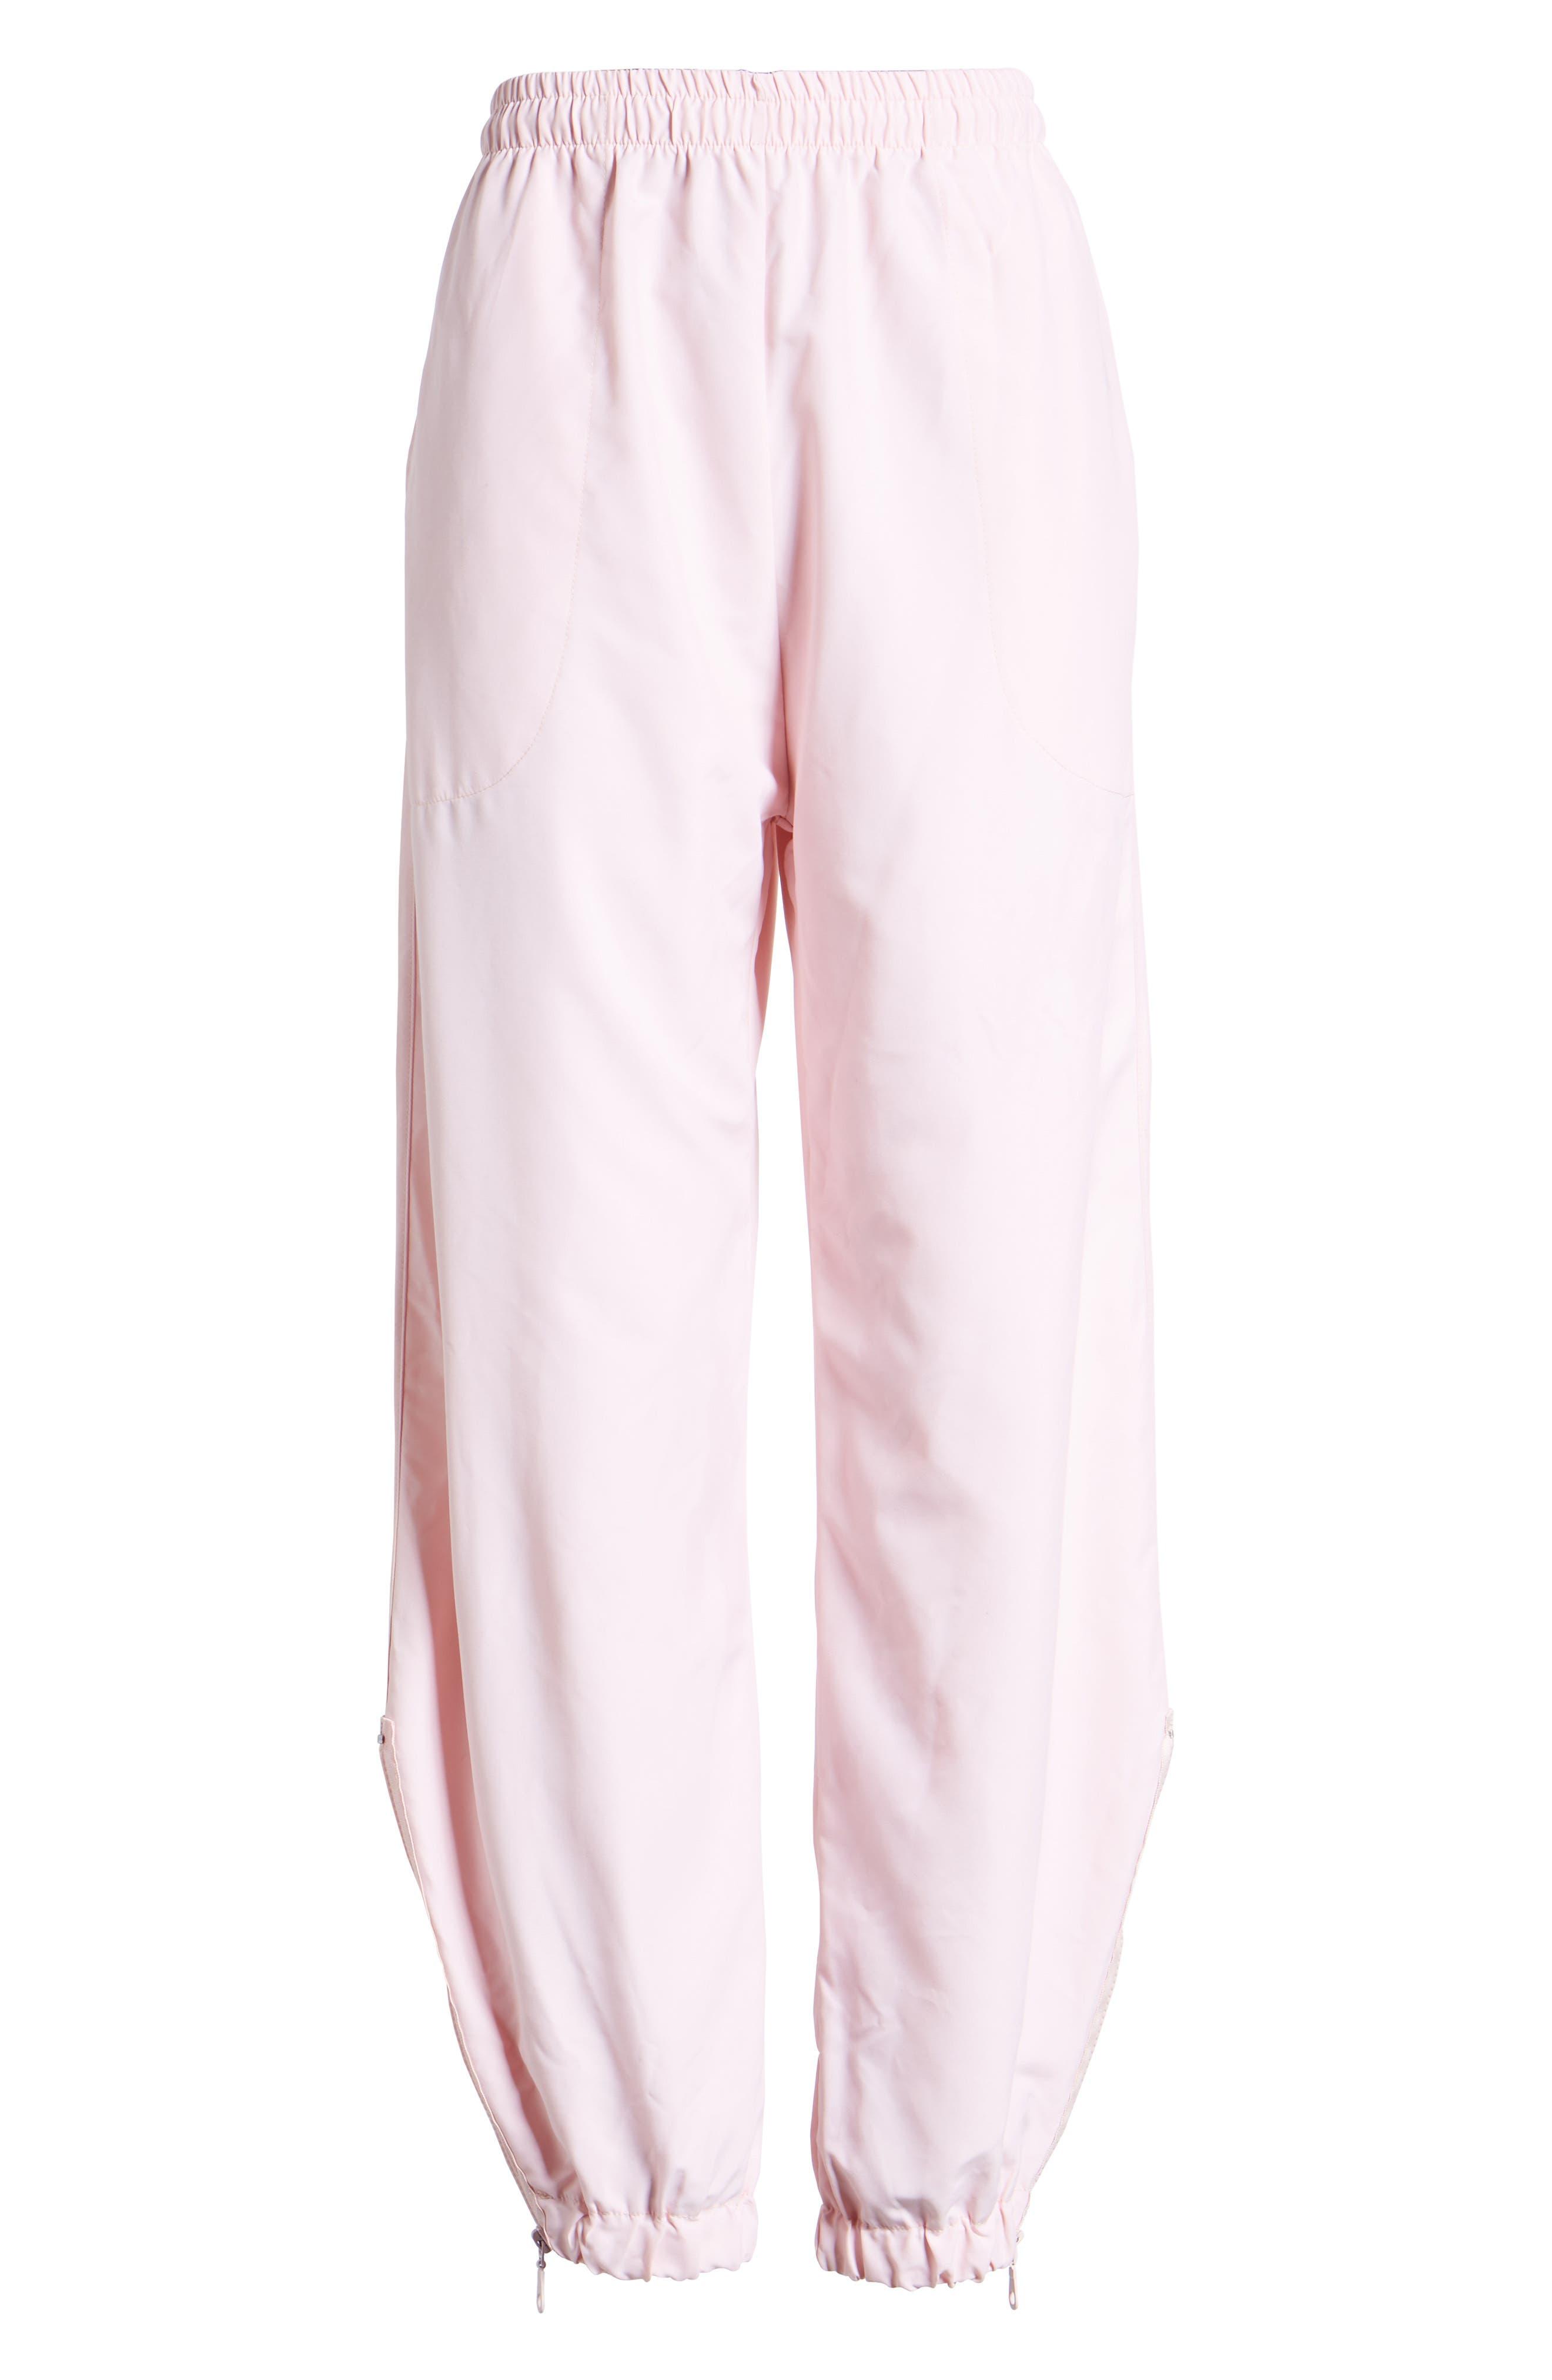 Windbreaker Pants,                             Alternate thumbnail 6, color,                             Pink